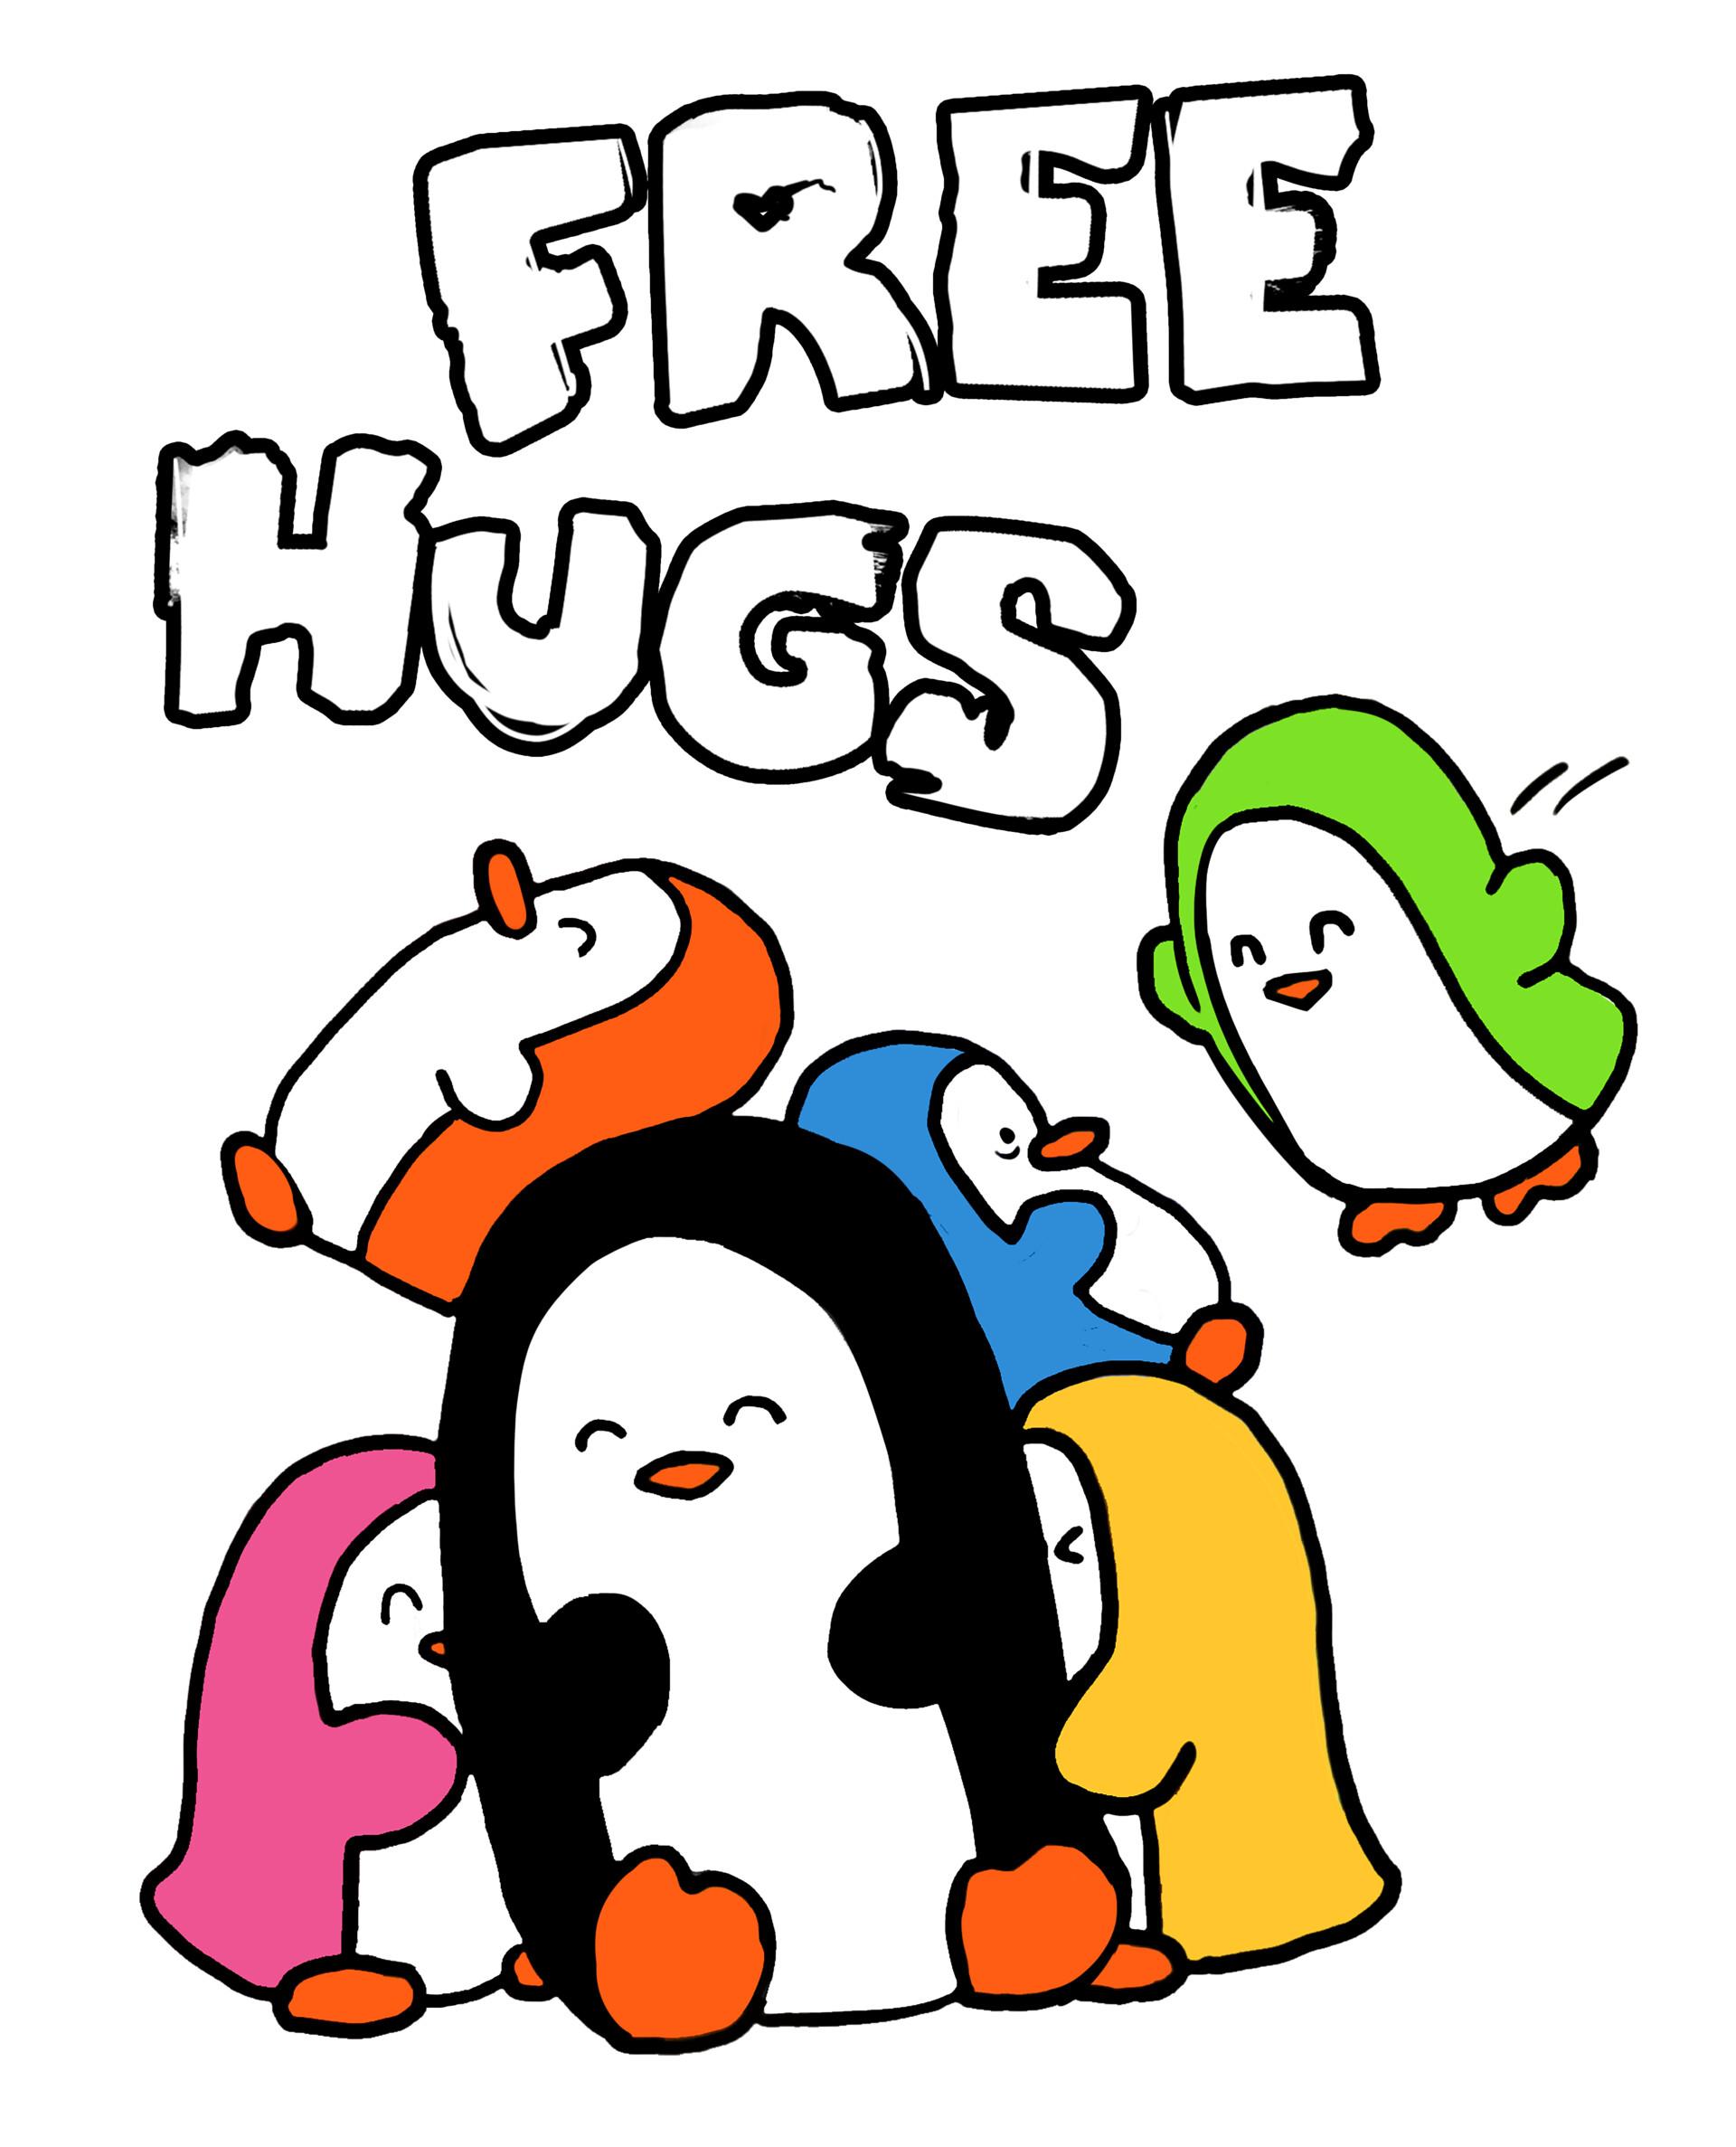 Shellz art free hugs remastered 2019